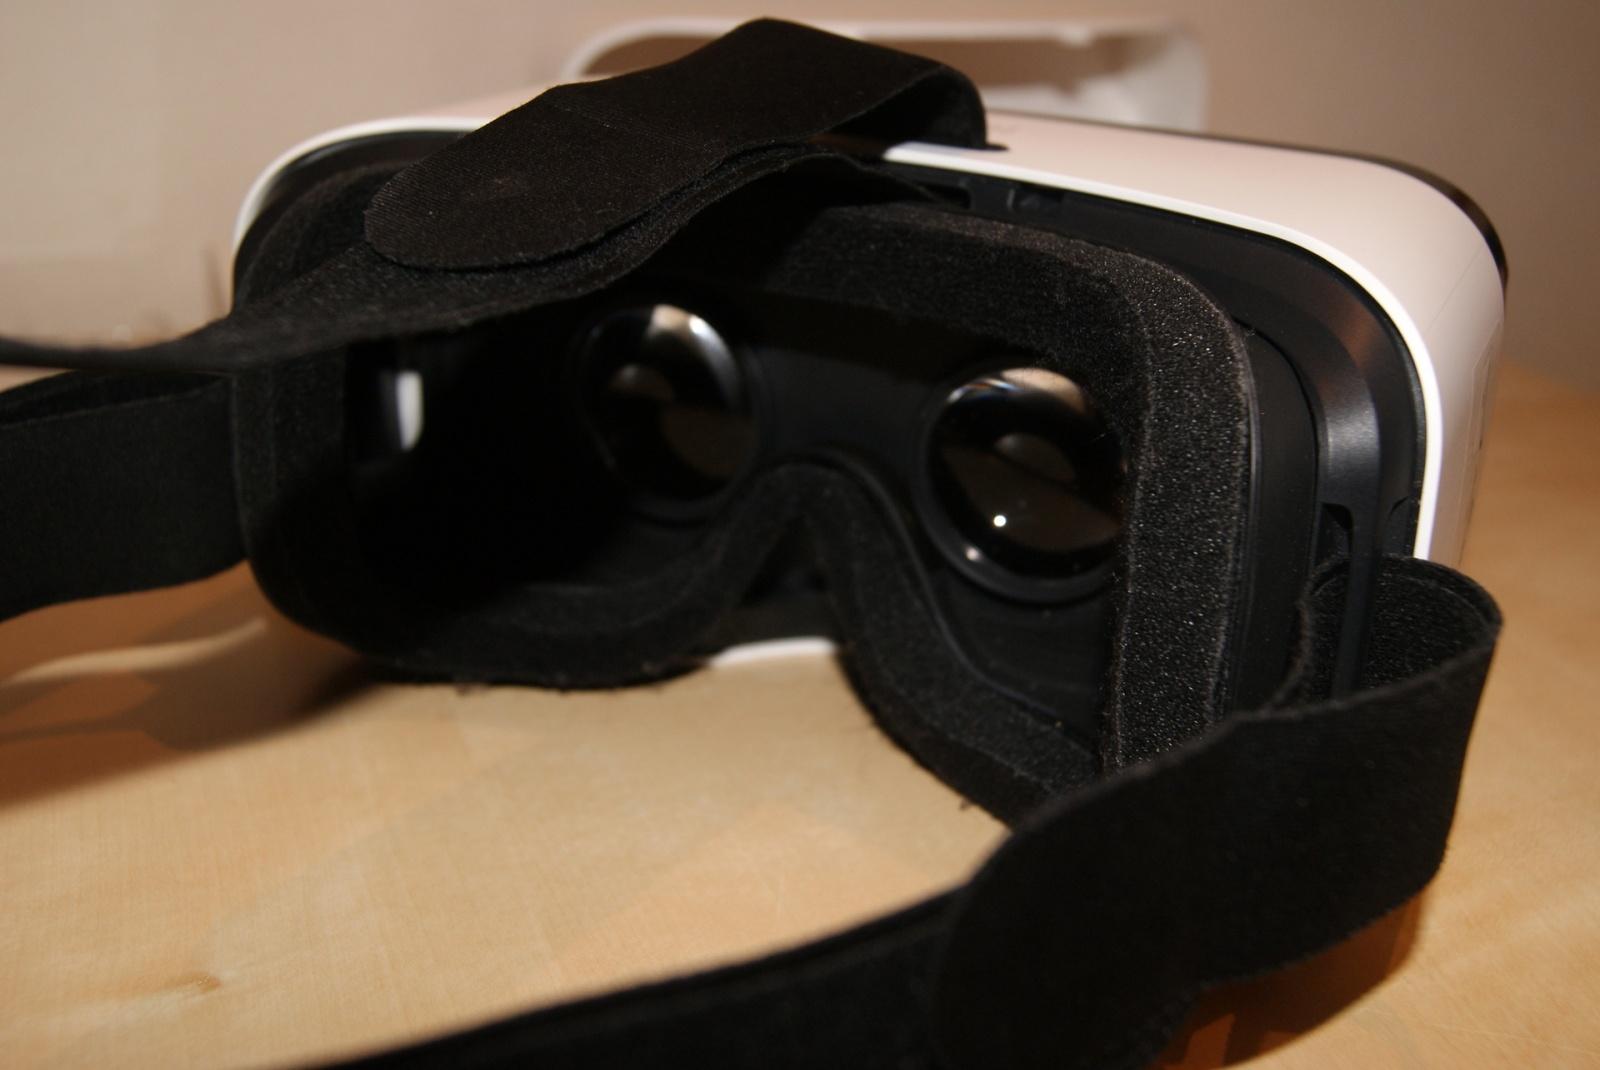 Обзор Alcatel IDOL 4S: виртуальная реальность из коробки - 20